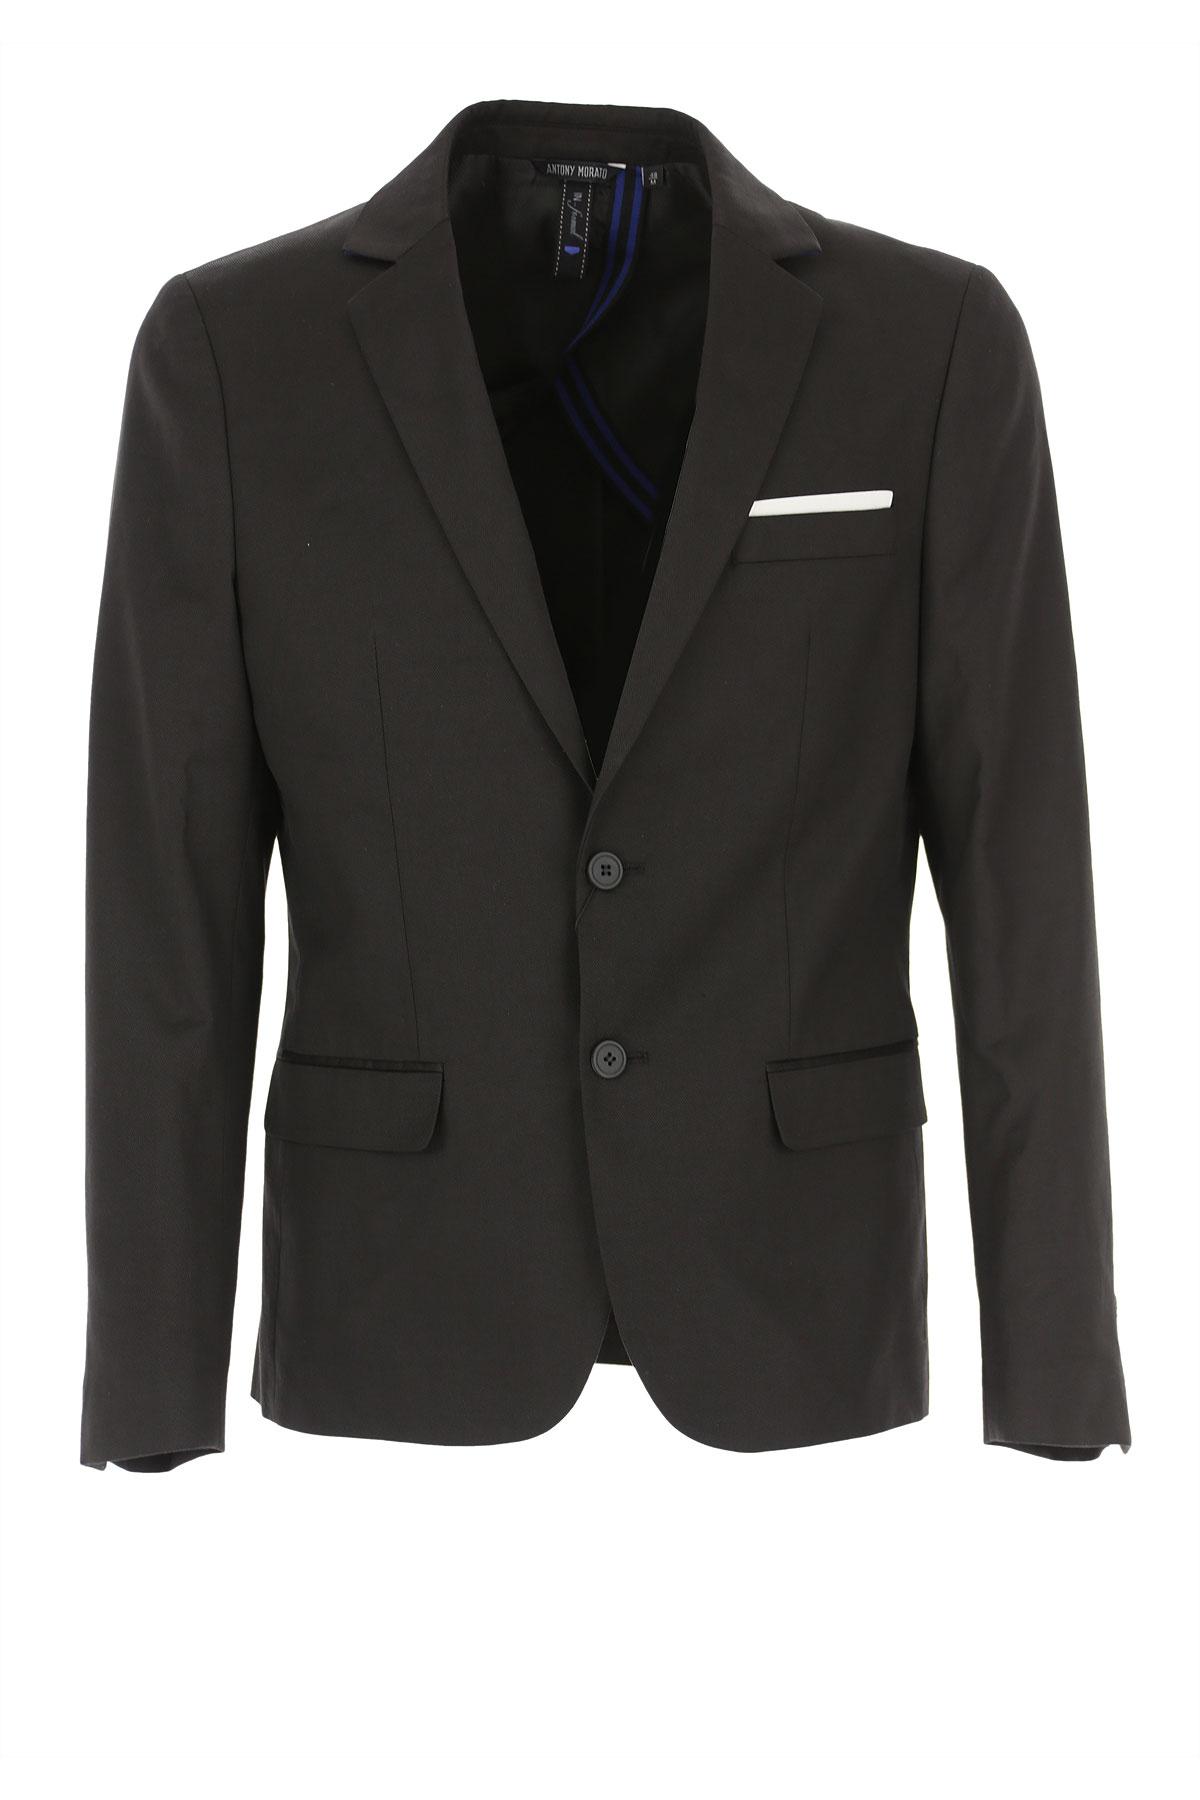 Antony Morato Blazer for Men, Sport Coat On Sale, Black, Cotton, 2019, L M S XL XS XXL